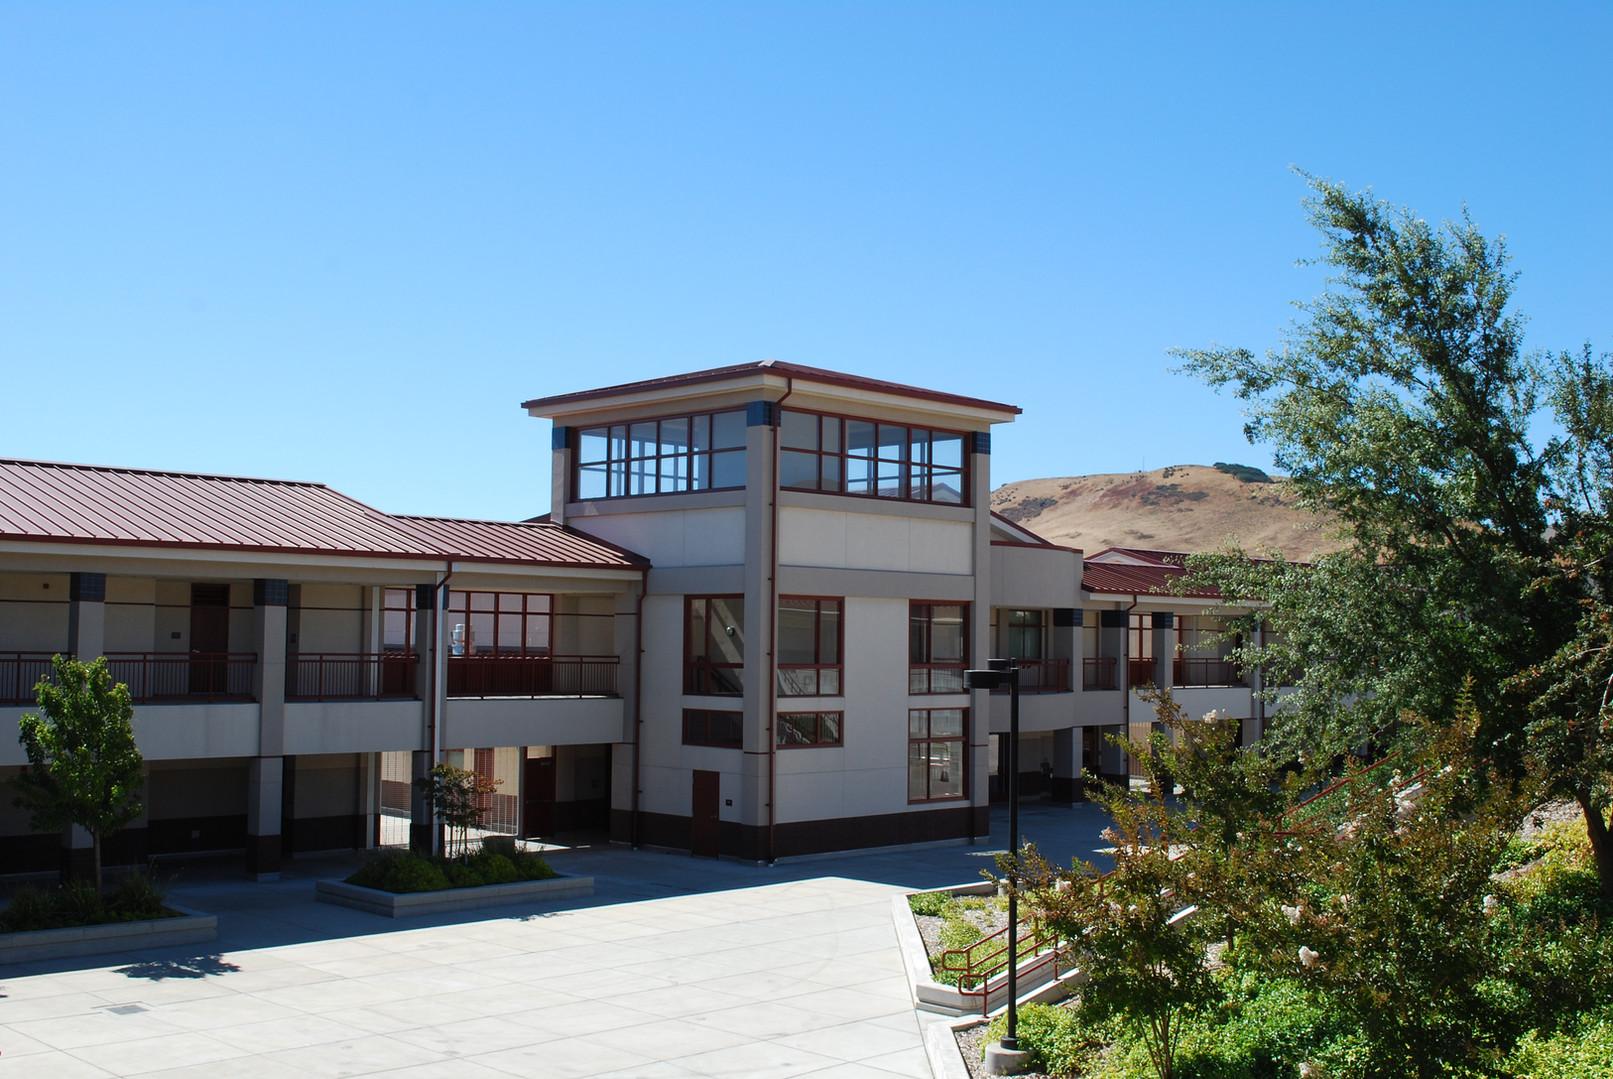 Cordelia Hills Elementary School Stairwell